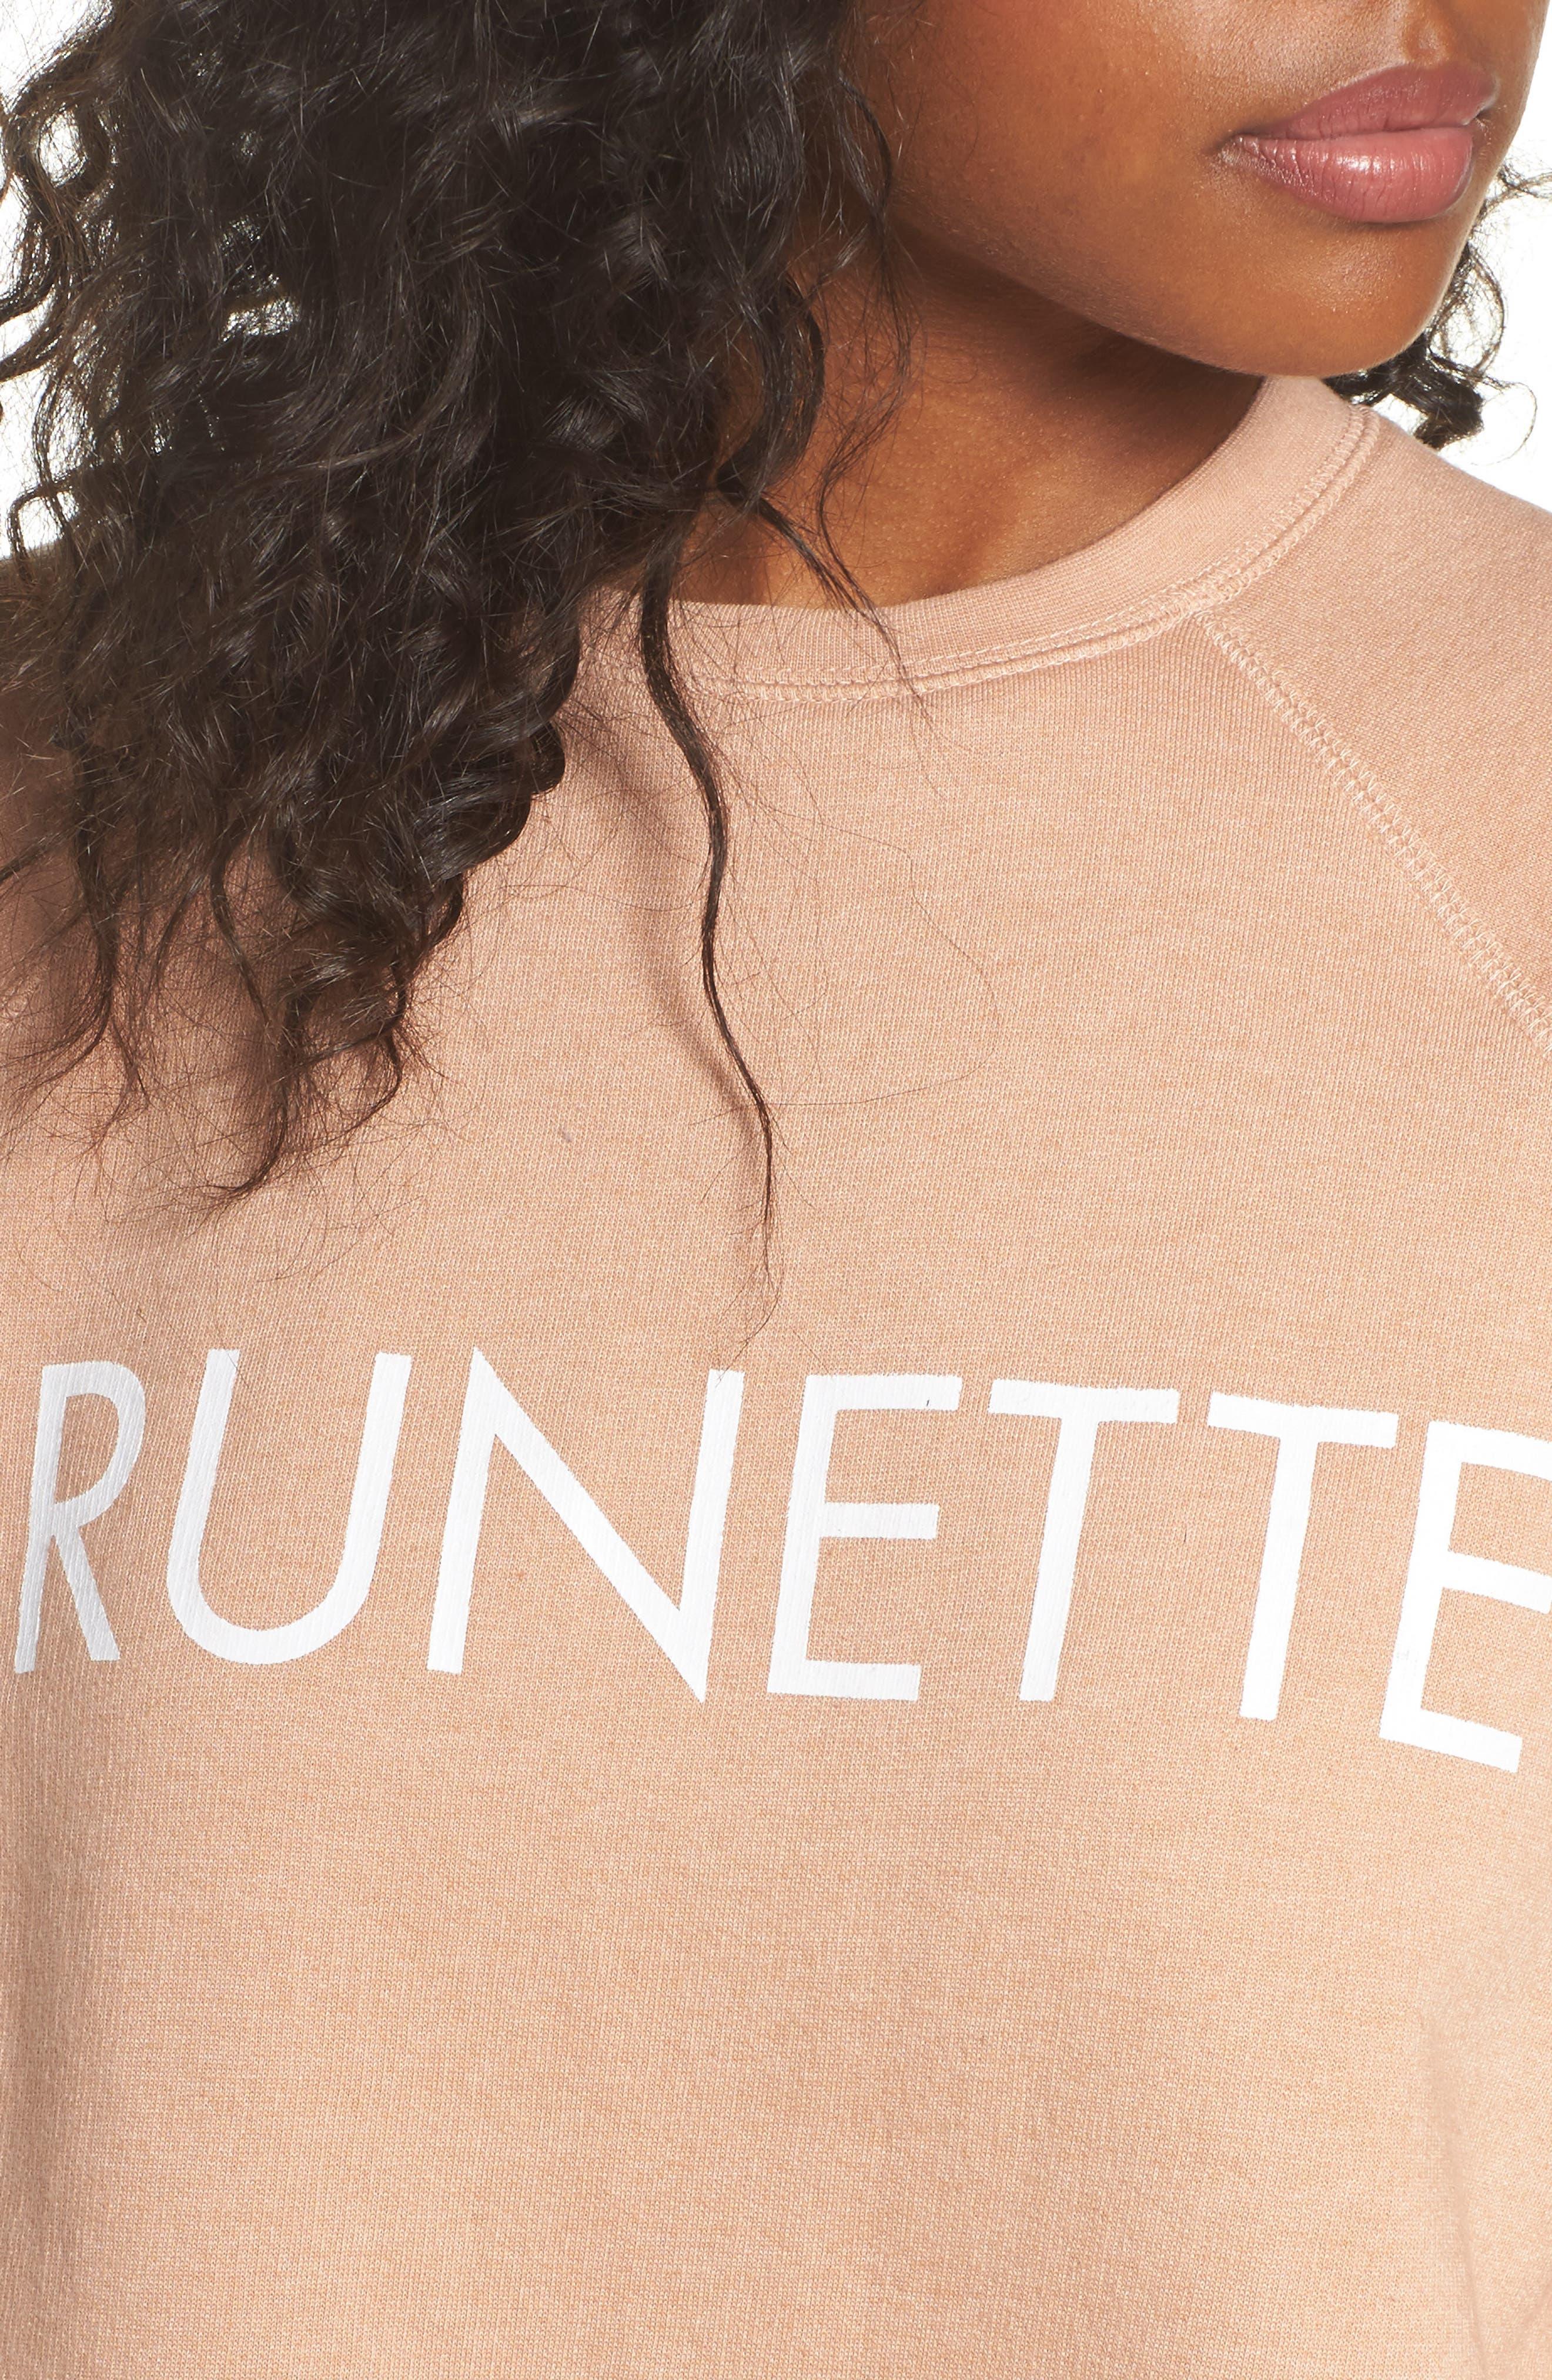 Middle Sister Brunette Sweatshirt,                             Alternate thumbnail 6, color,                             Rose